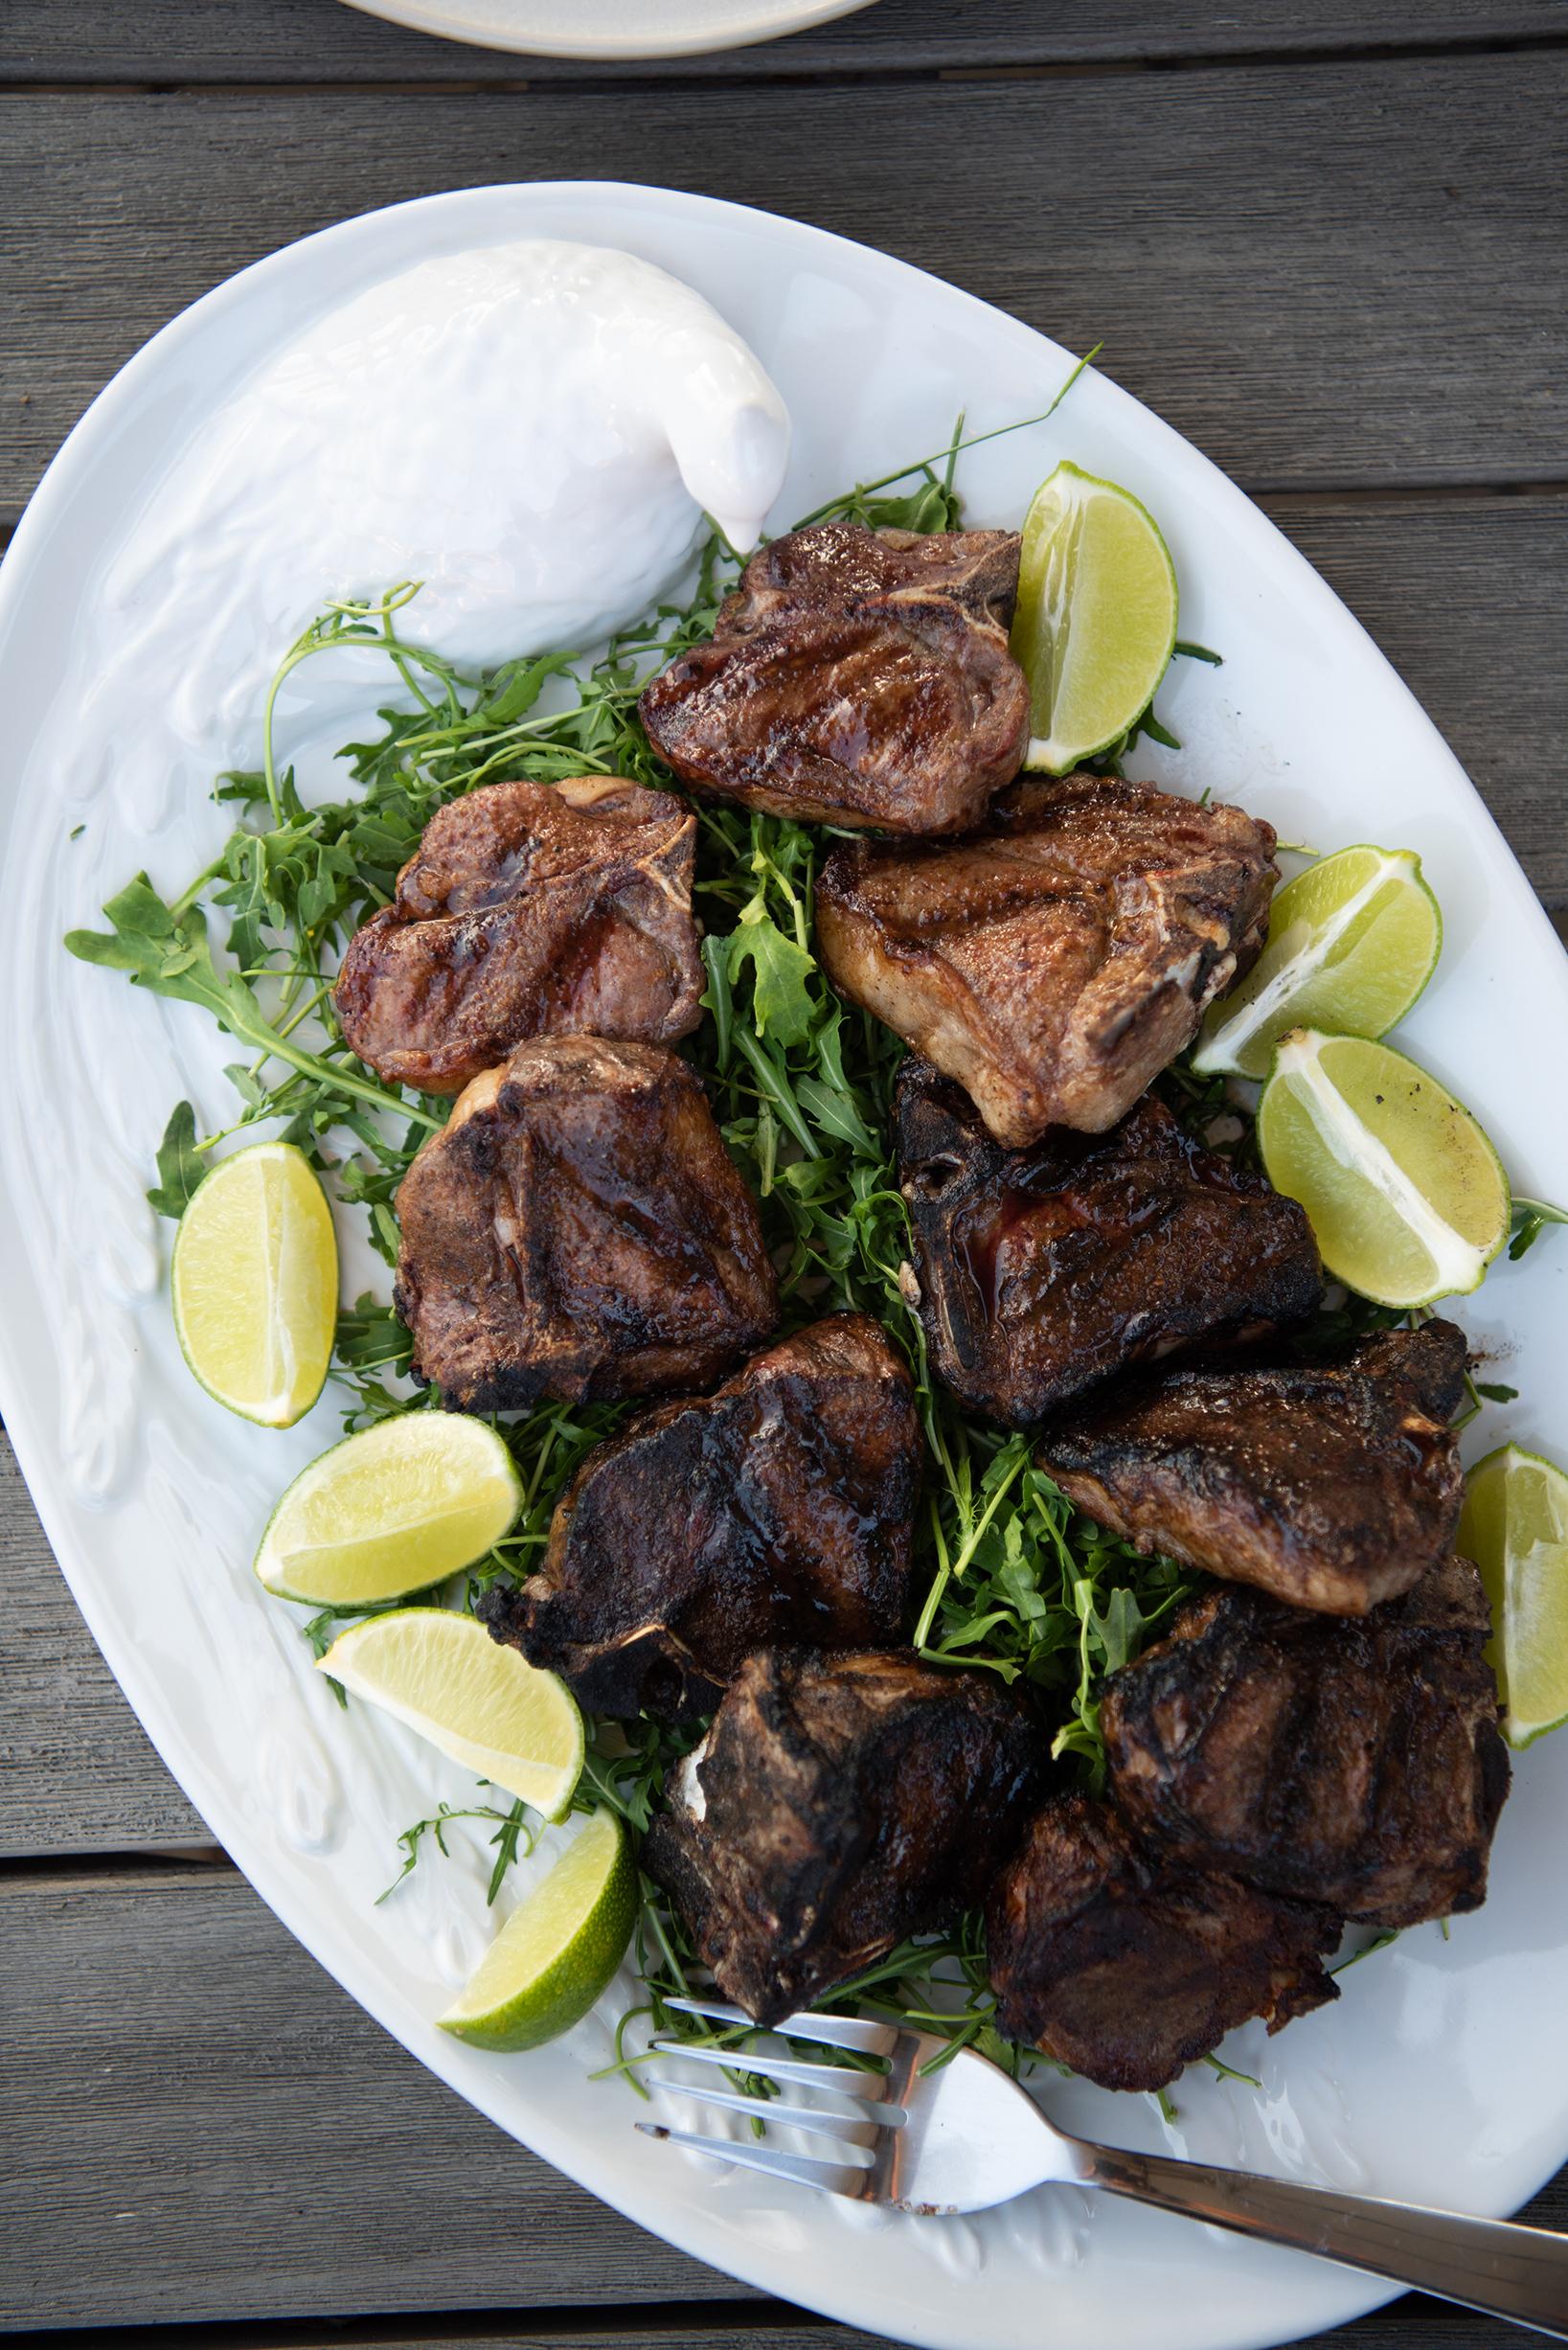 lamb dinner-28459.jpgGrilled lamb chops with garam masala and cumin| Nik Sharma